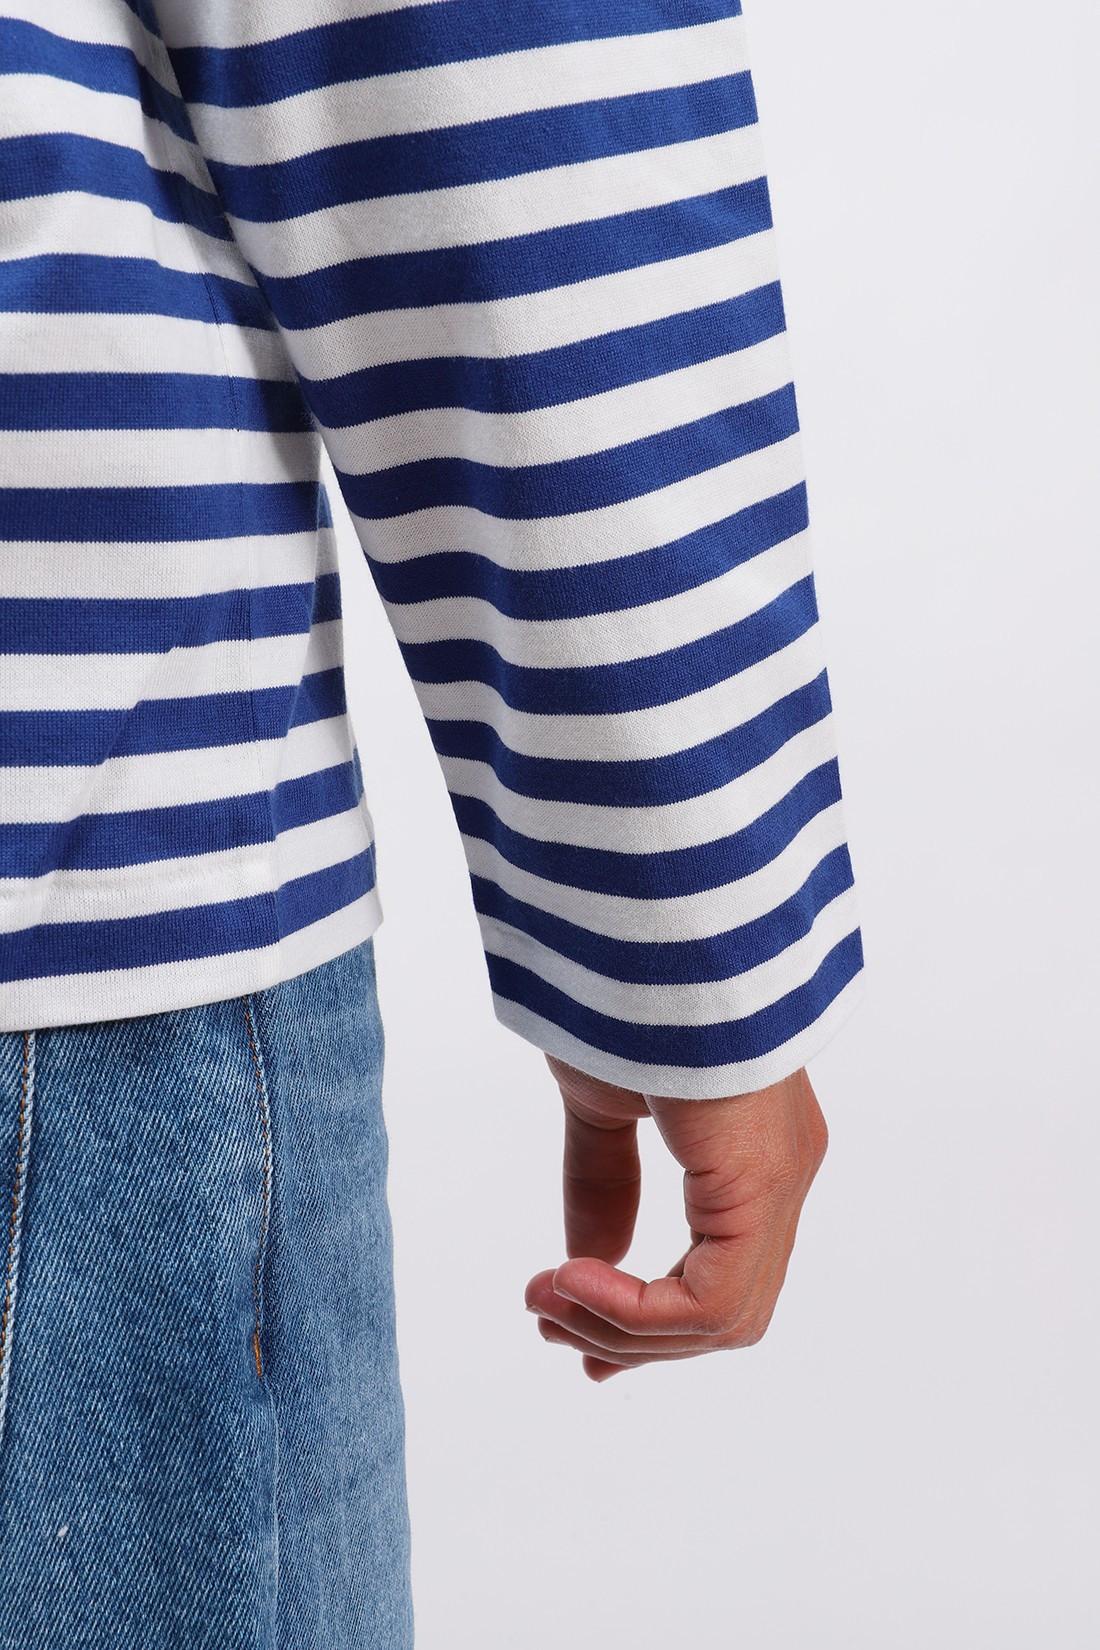 COMME DES GARÇONS PLAY / Play striped t-shirt Navy white